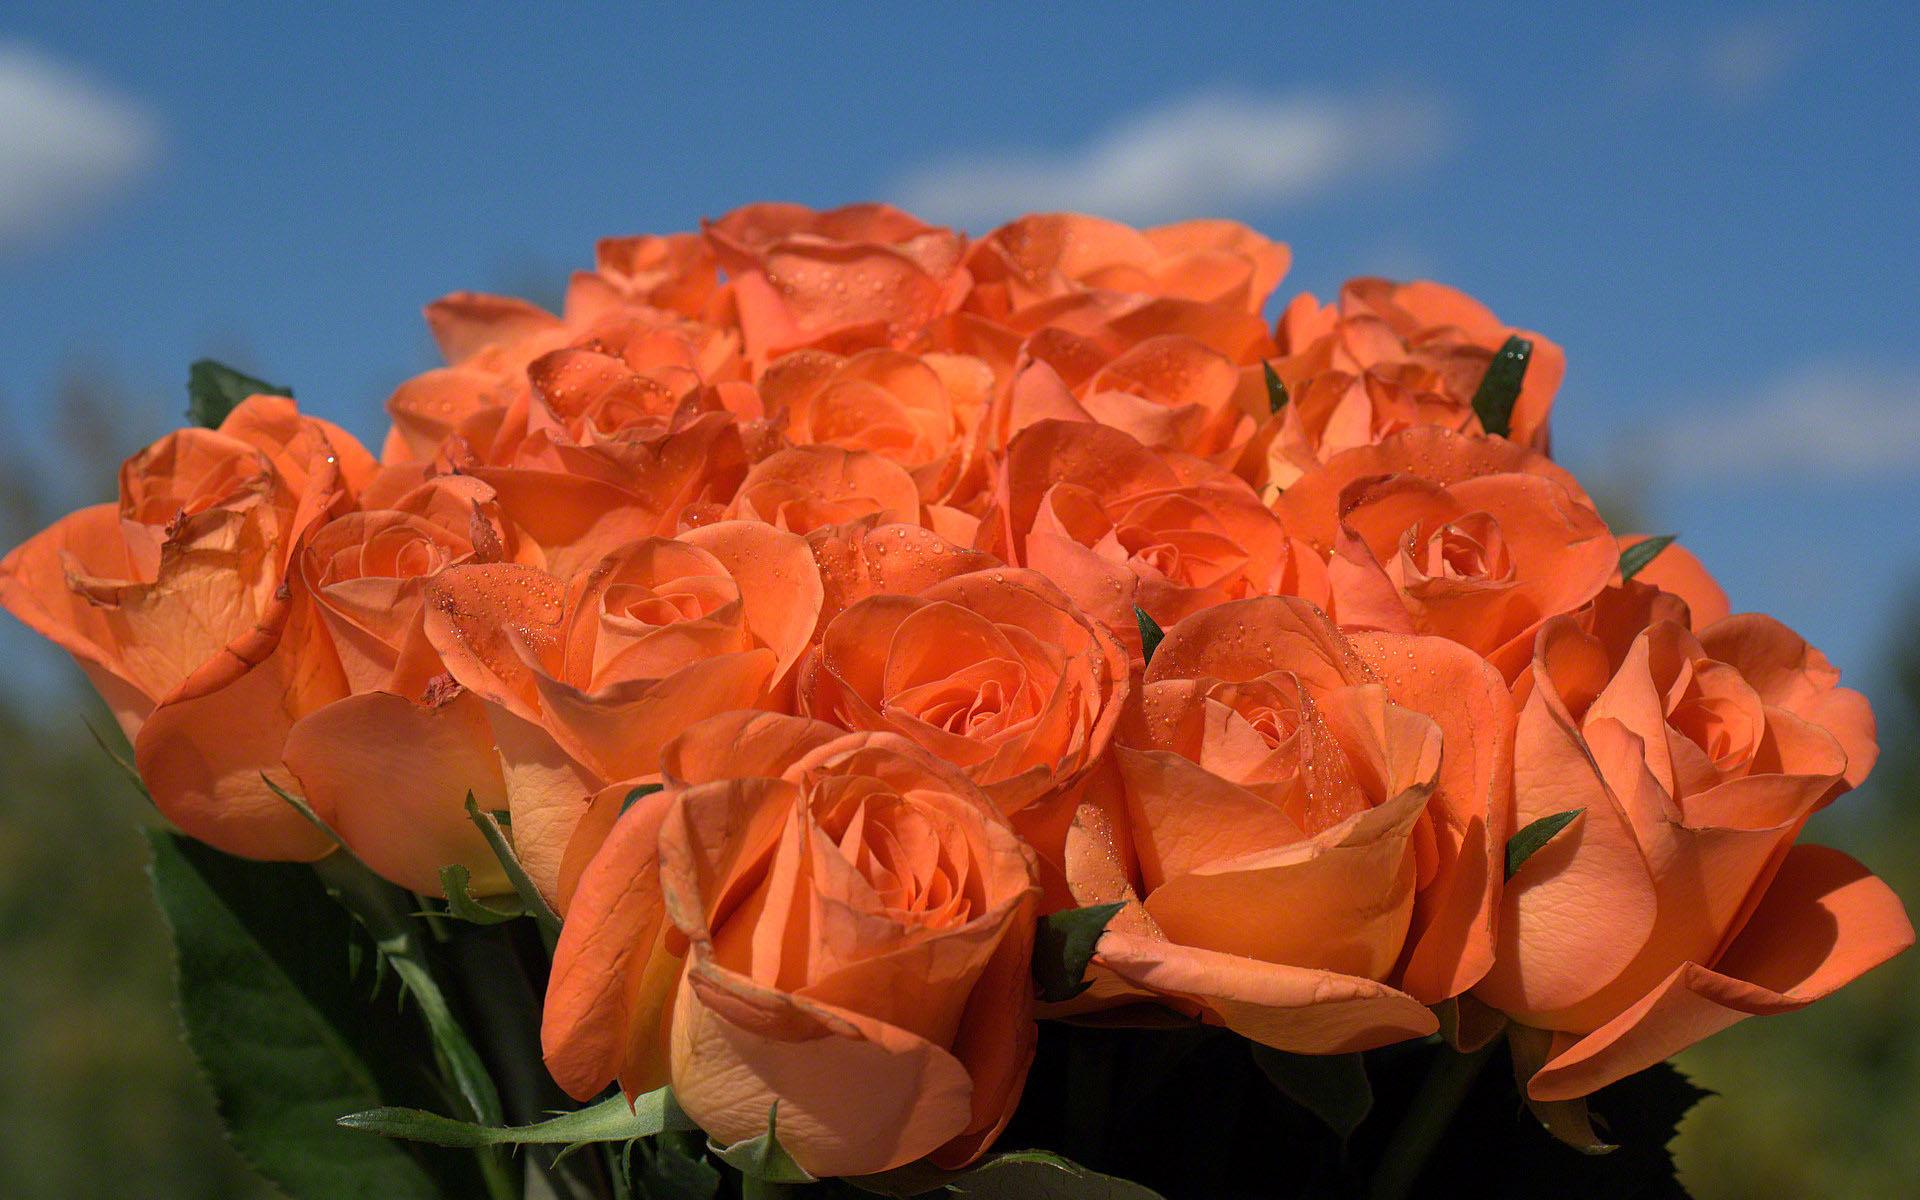 http://www.fabiovisentin.com/photography/photo/12/roses-photo-wallpaper-02517.jpg